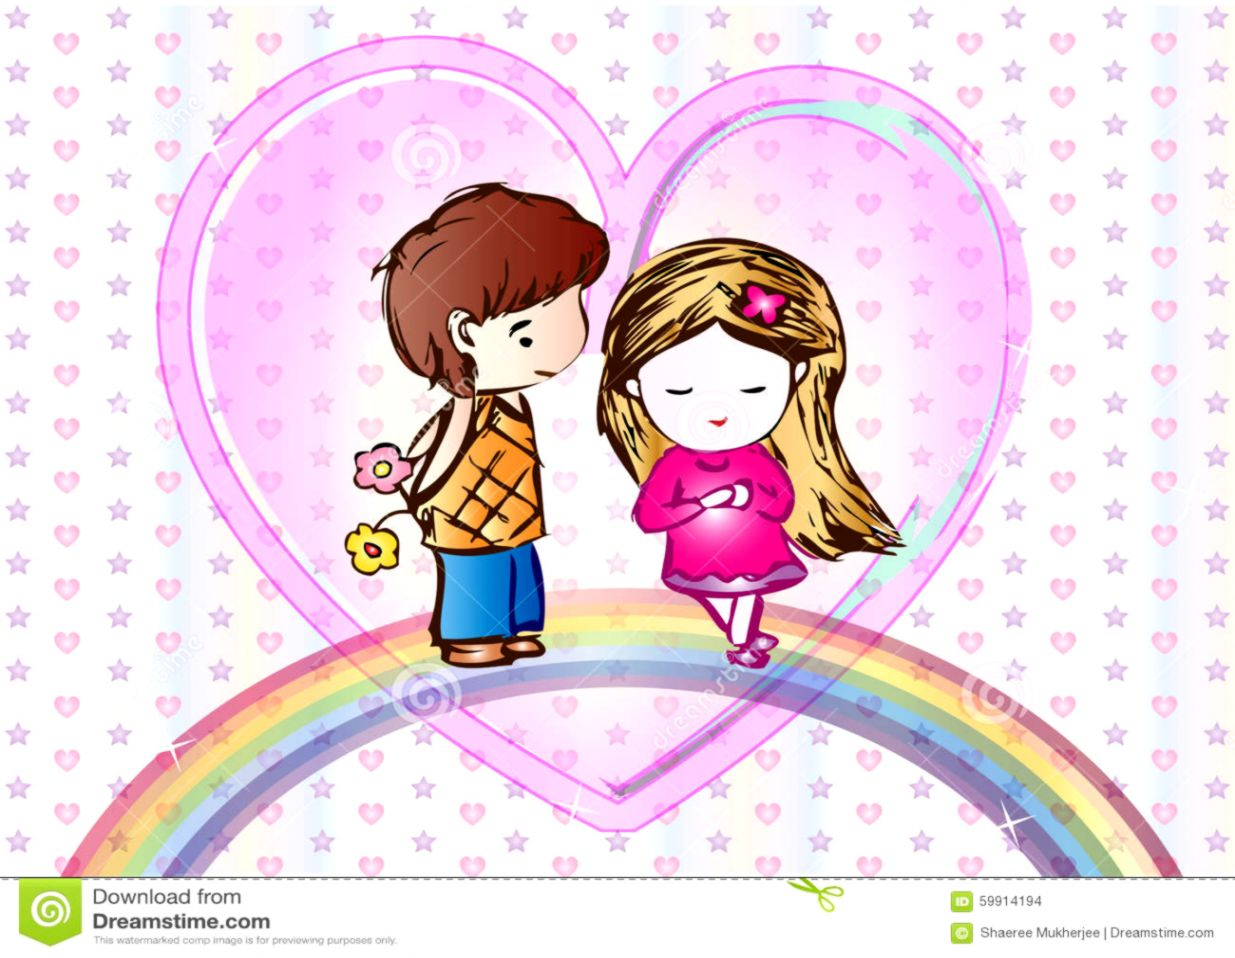 My Heart Cute Cartoon Angel Girl Wallpapers Hd Wallpapers App